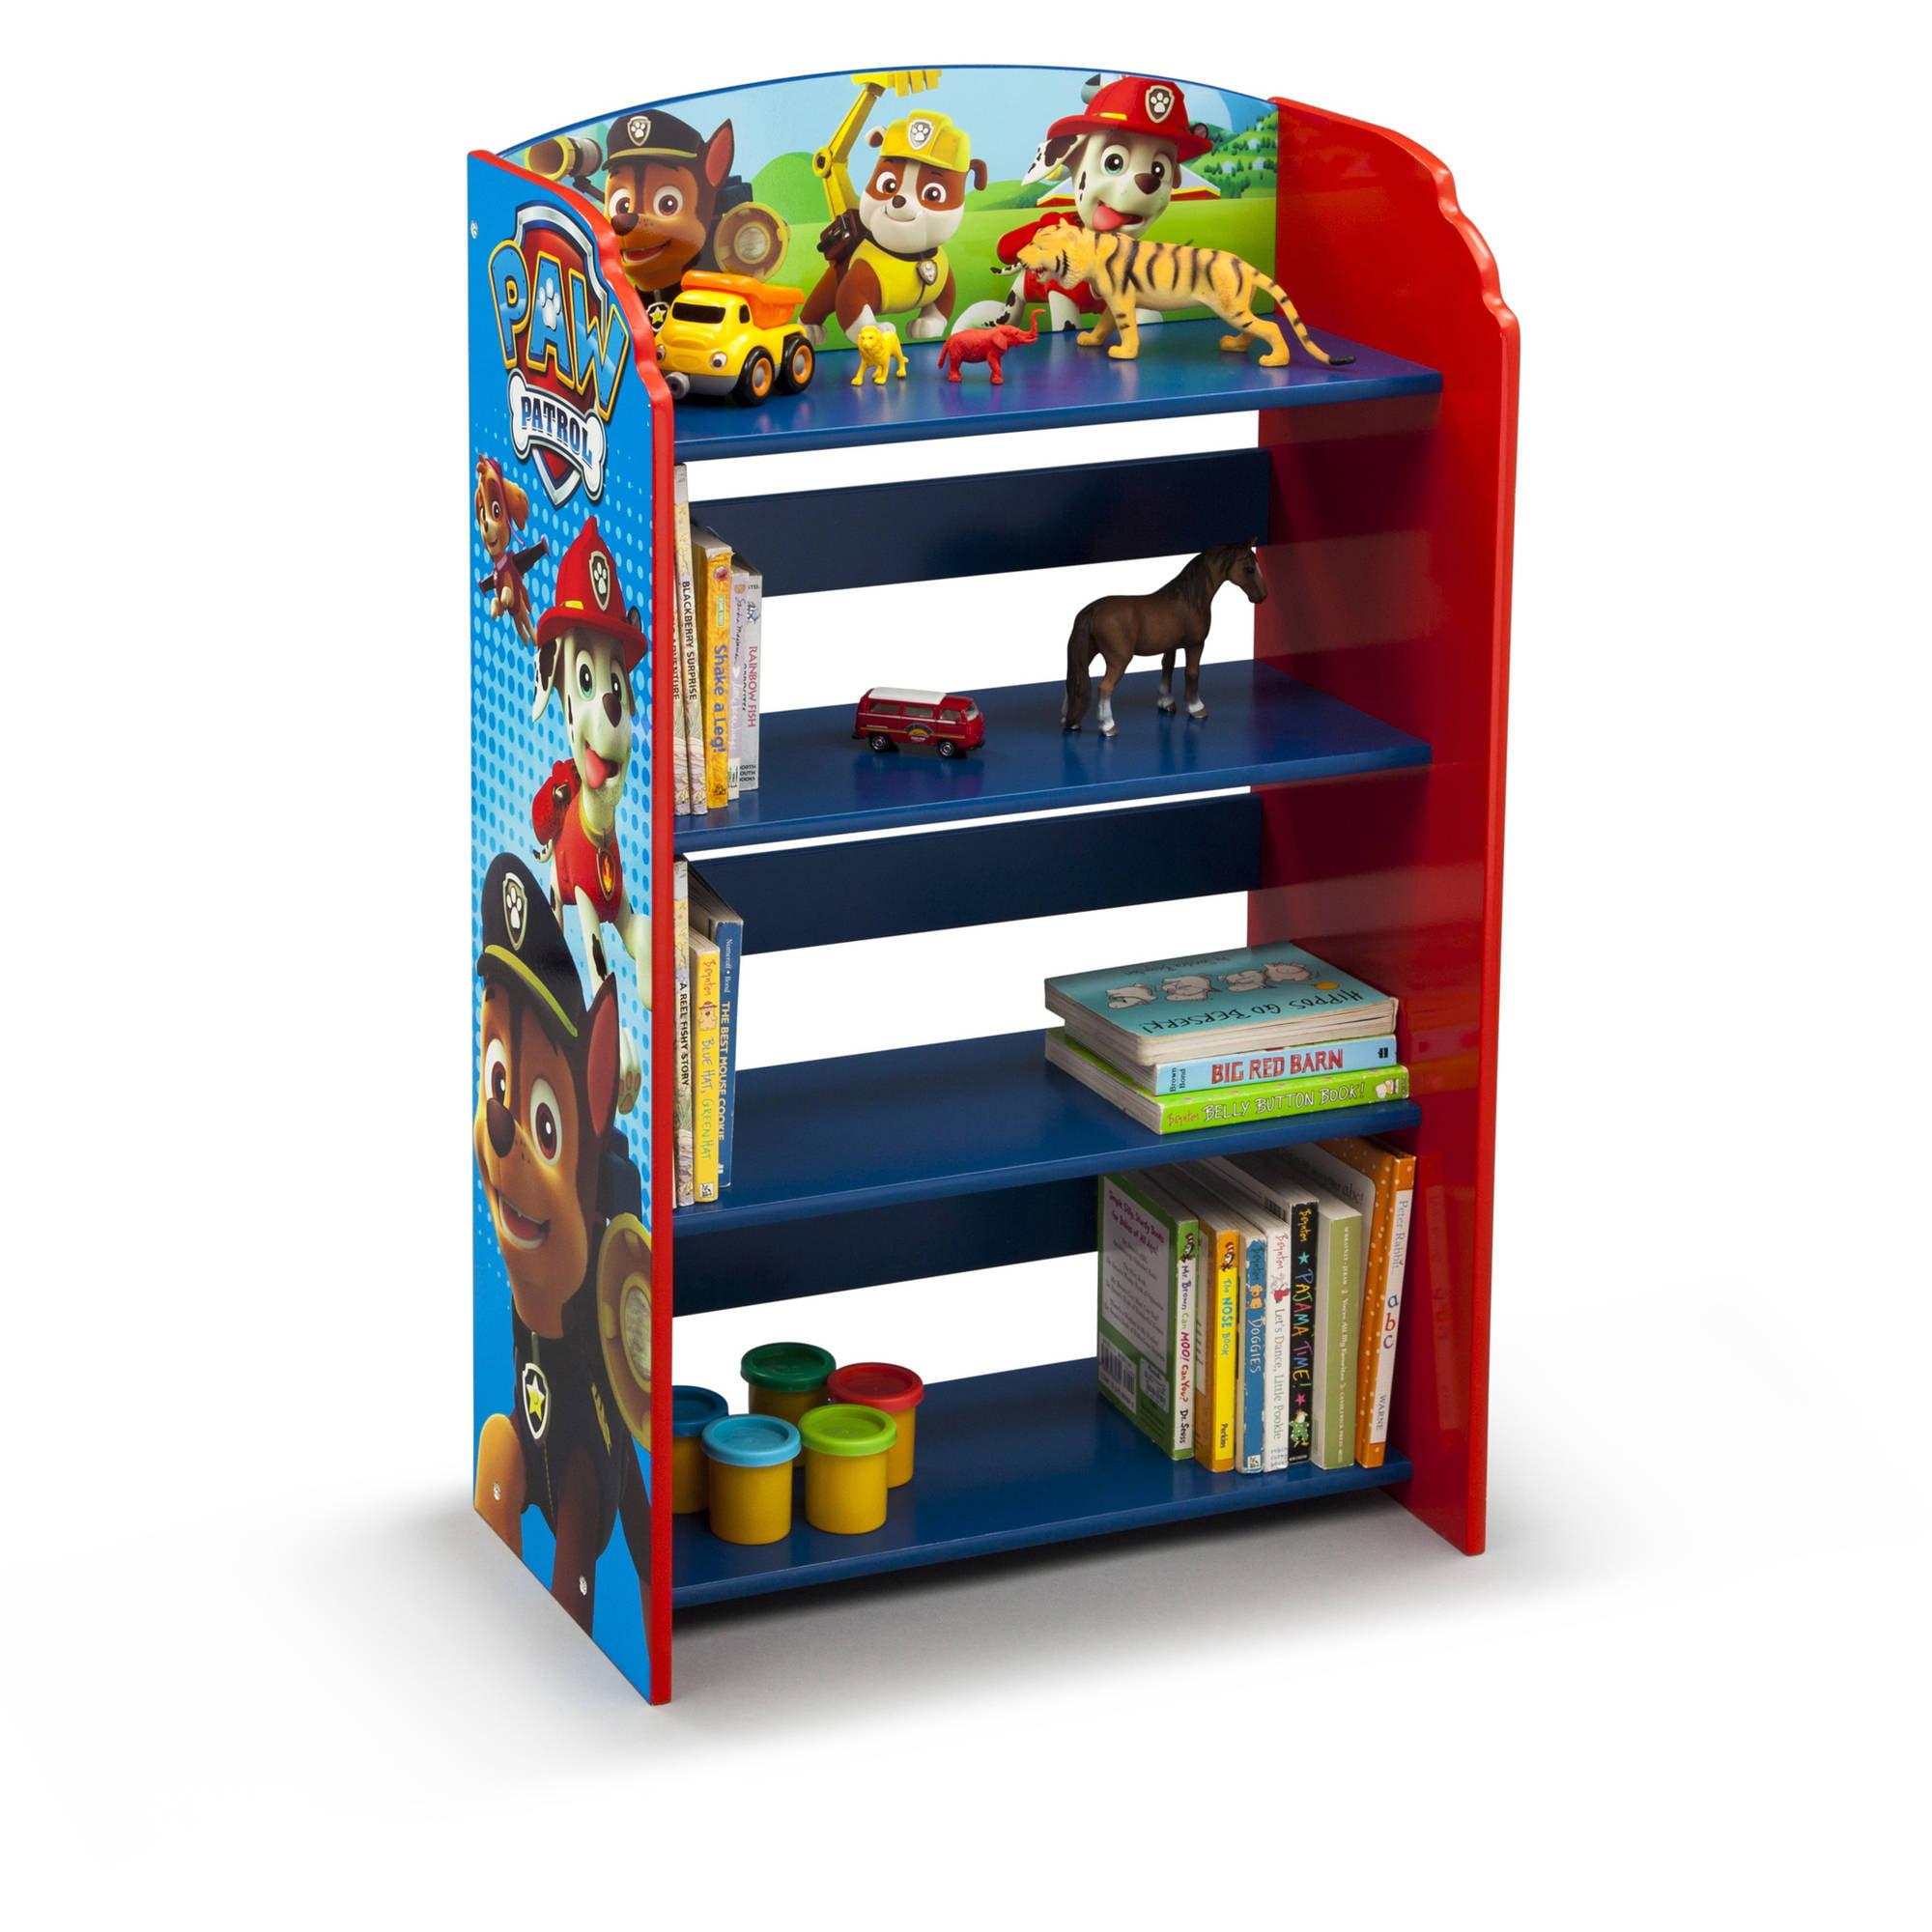 Delta Children PAW Patrol Bookshelf